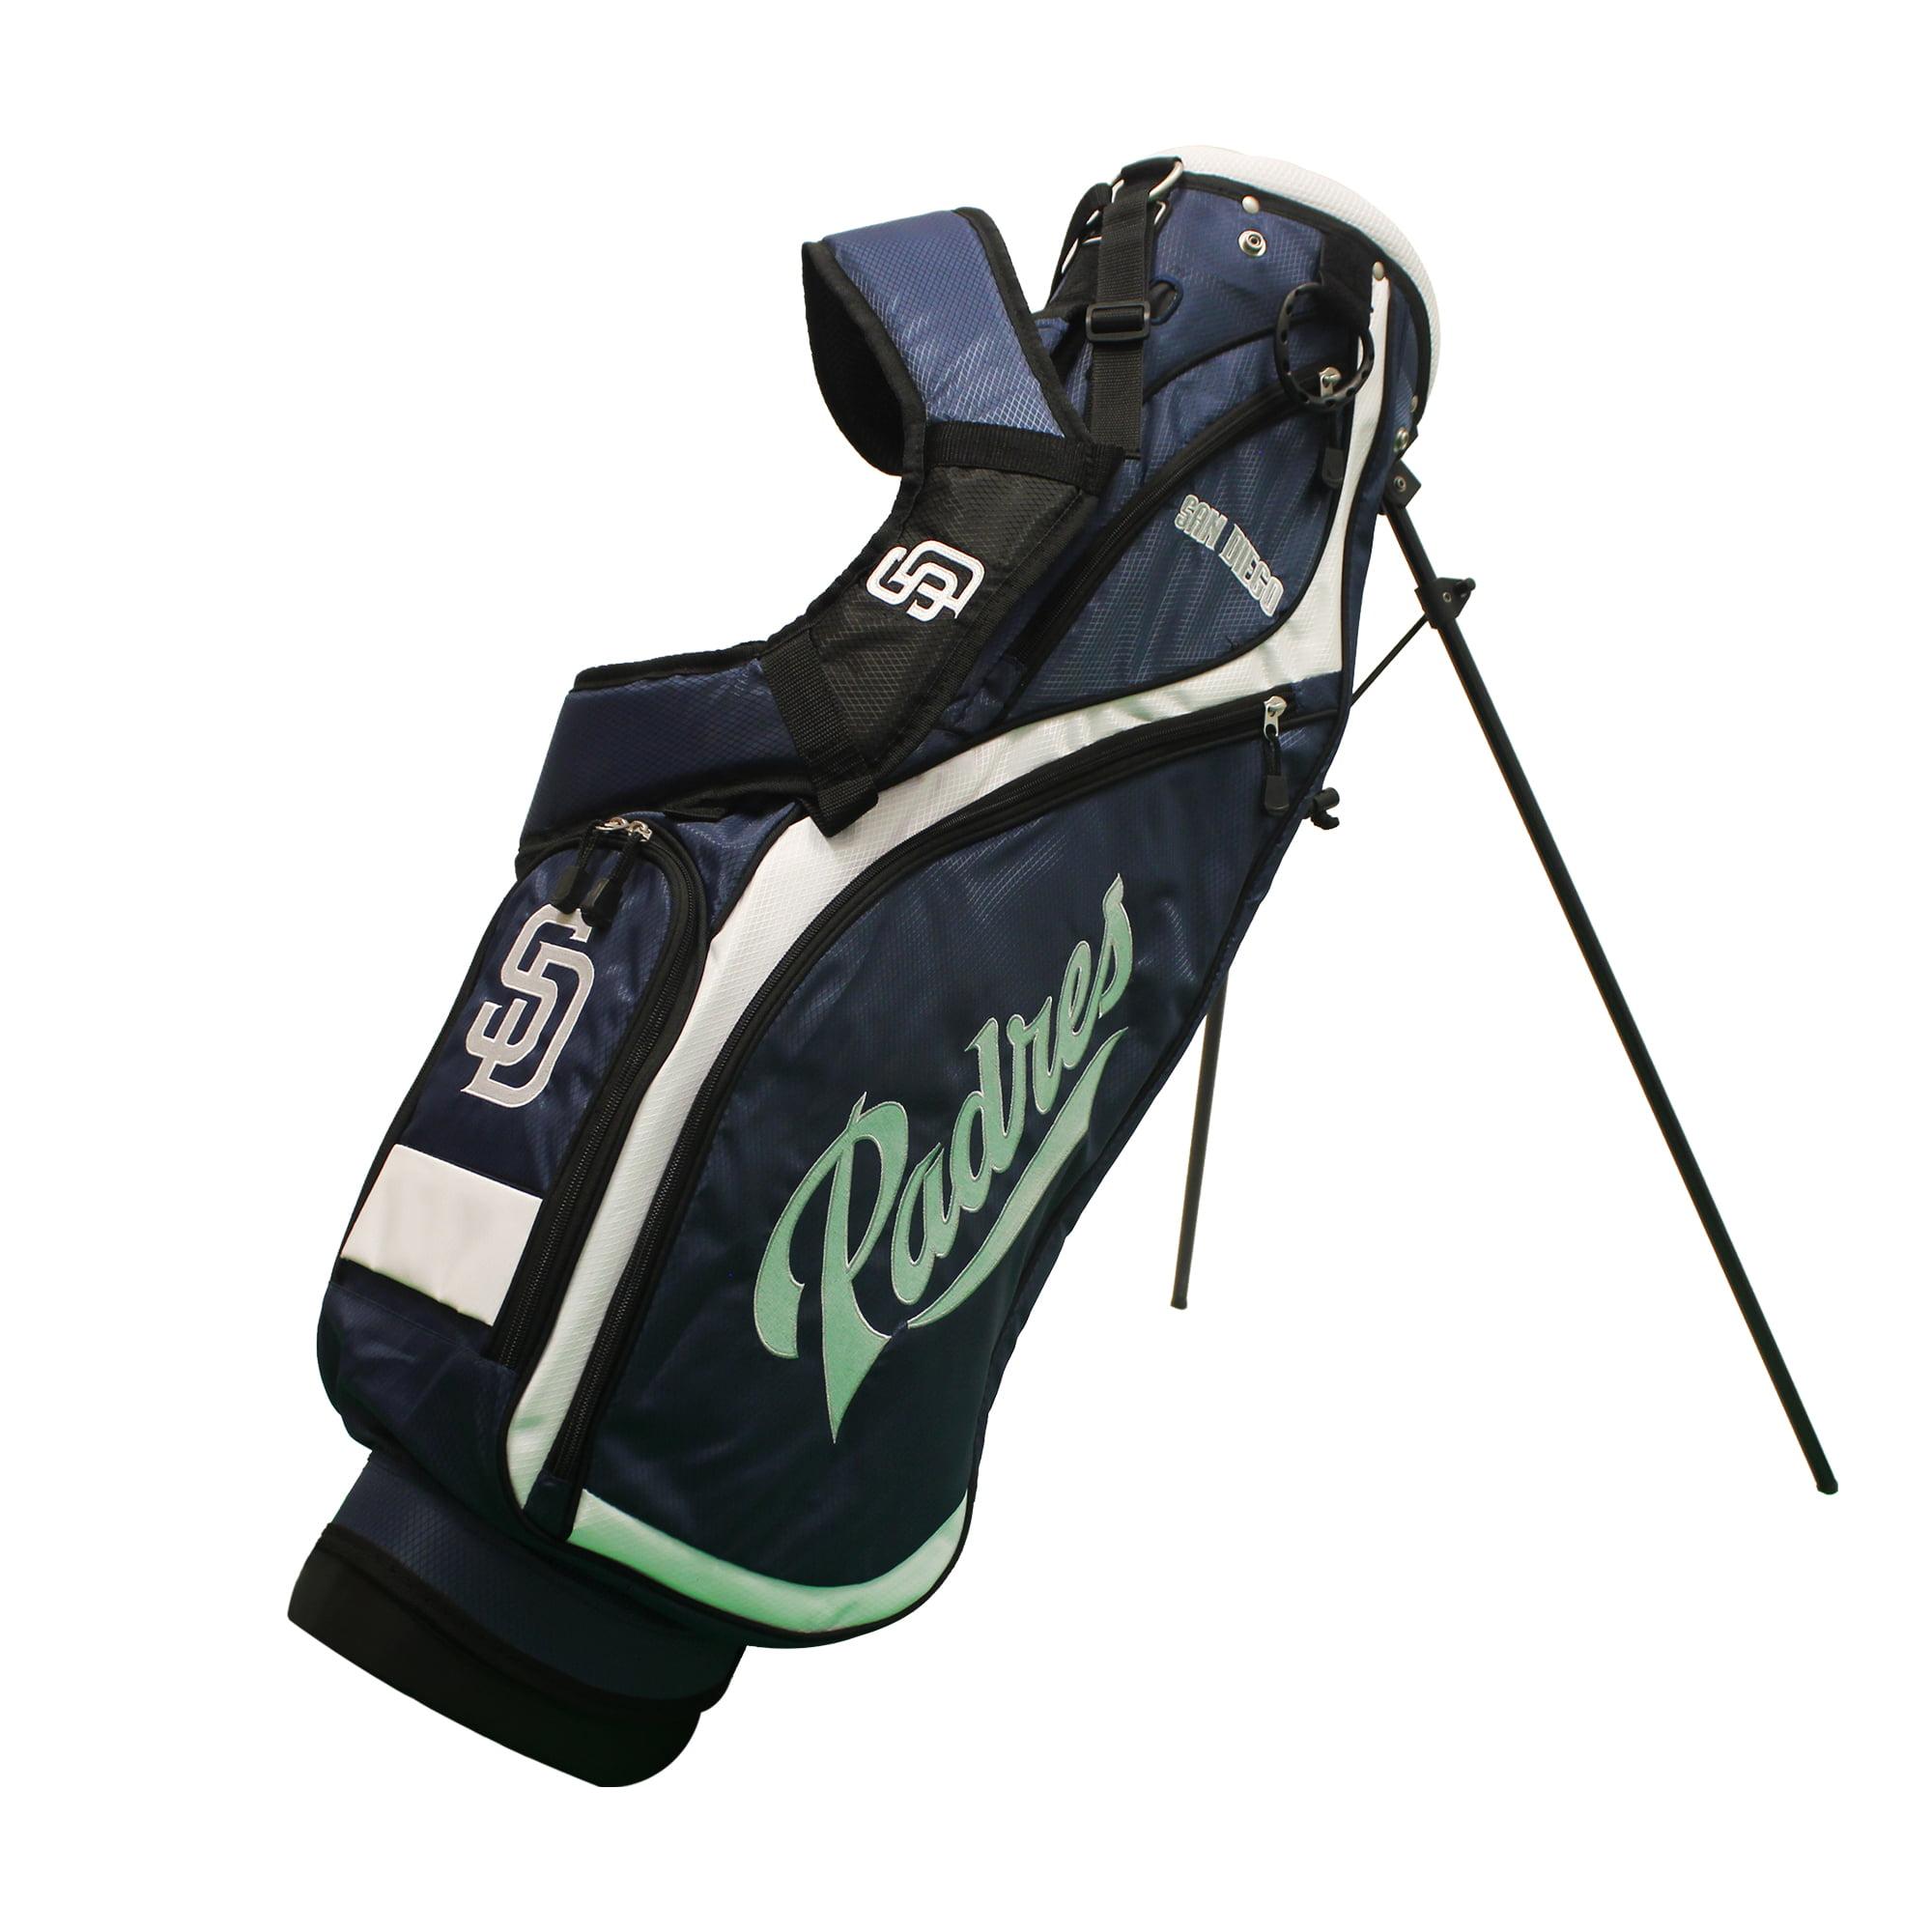 San Diego Padres Nassau Stand Golf Bag, Multi